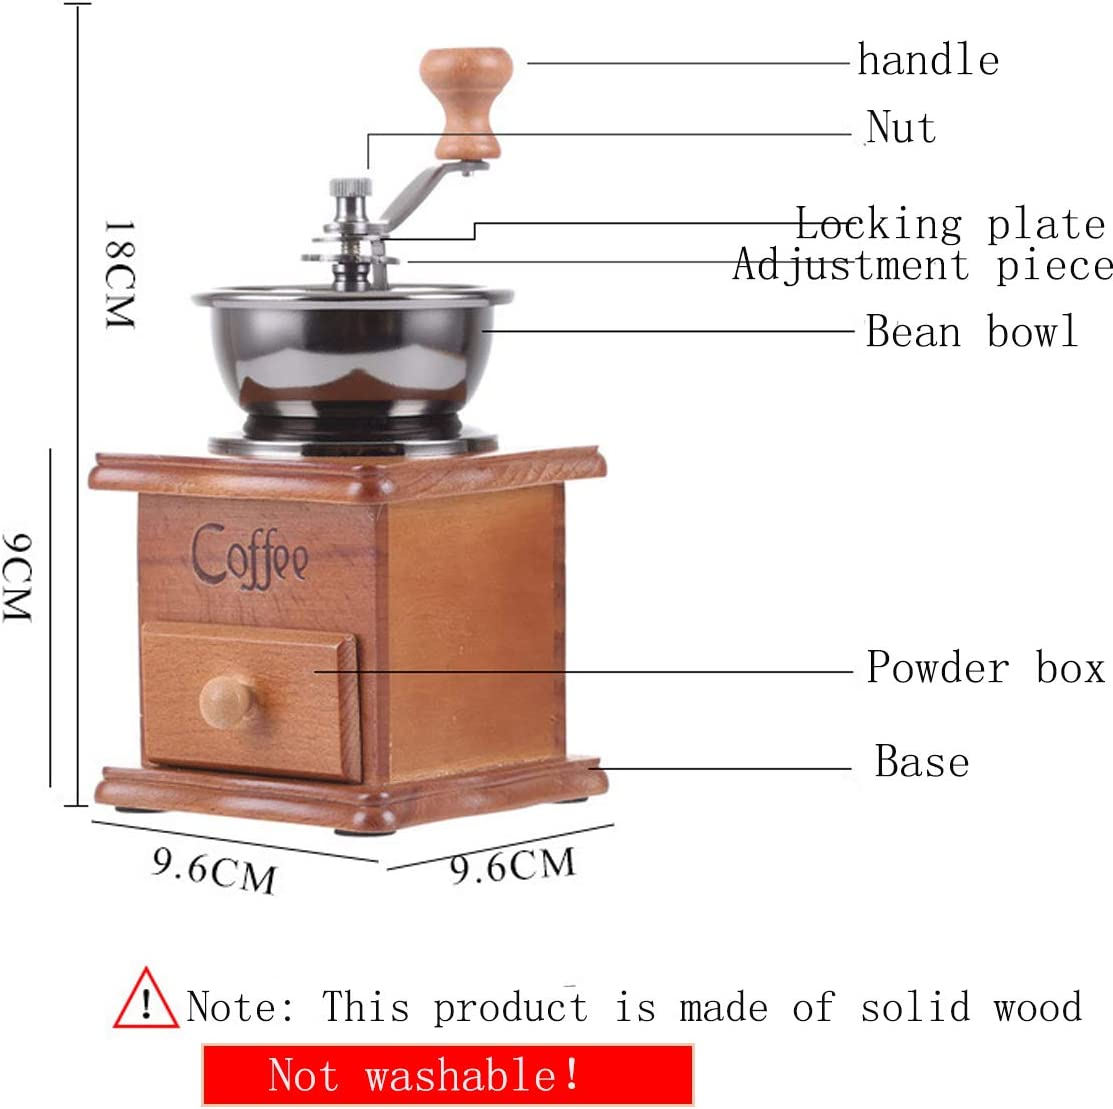 Braunes Holz Reisen Gro/ße Kapazit/ät Camping dancepandas Kaffeem/ühle Manuell Holz Retro Keramik Handkaffeem/ühle Keramikmahlwerkcoffee Bean Grinder Manual Verstellbar Handkurbel tragbar